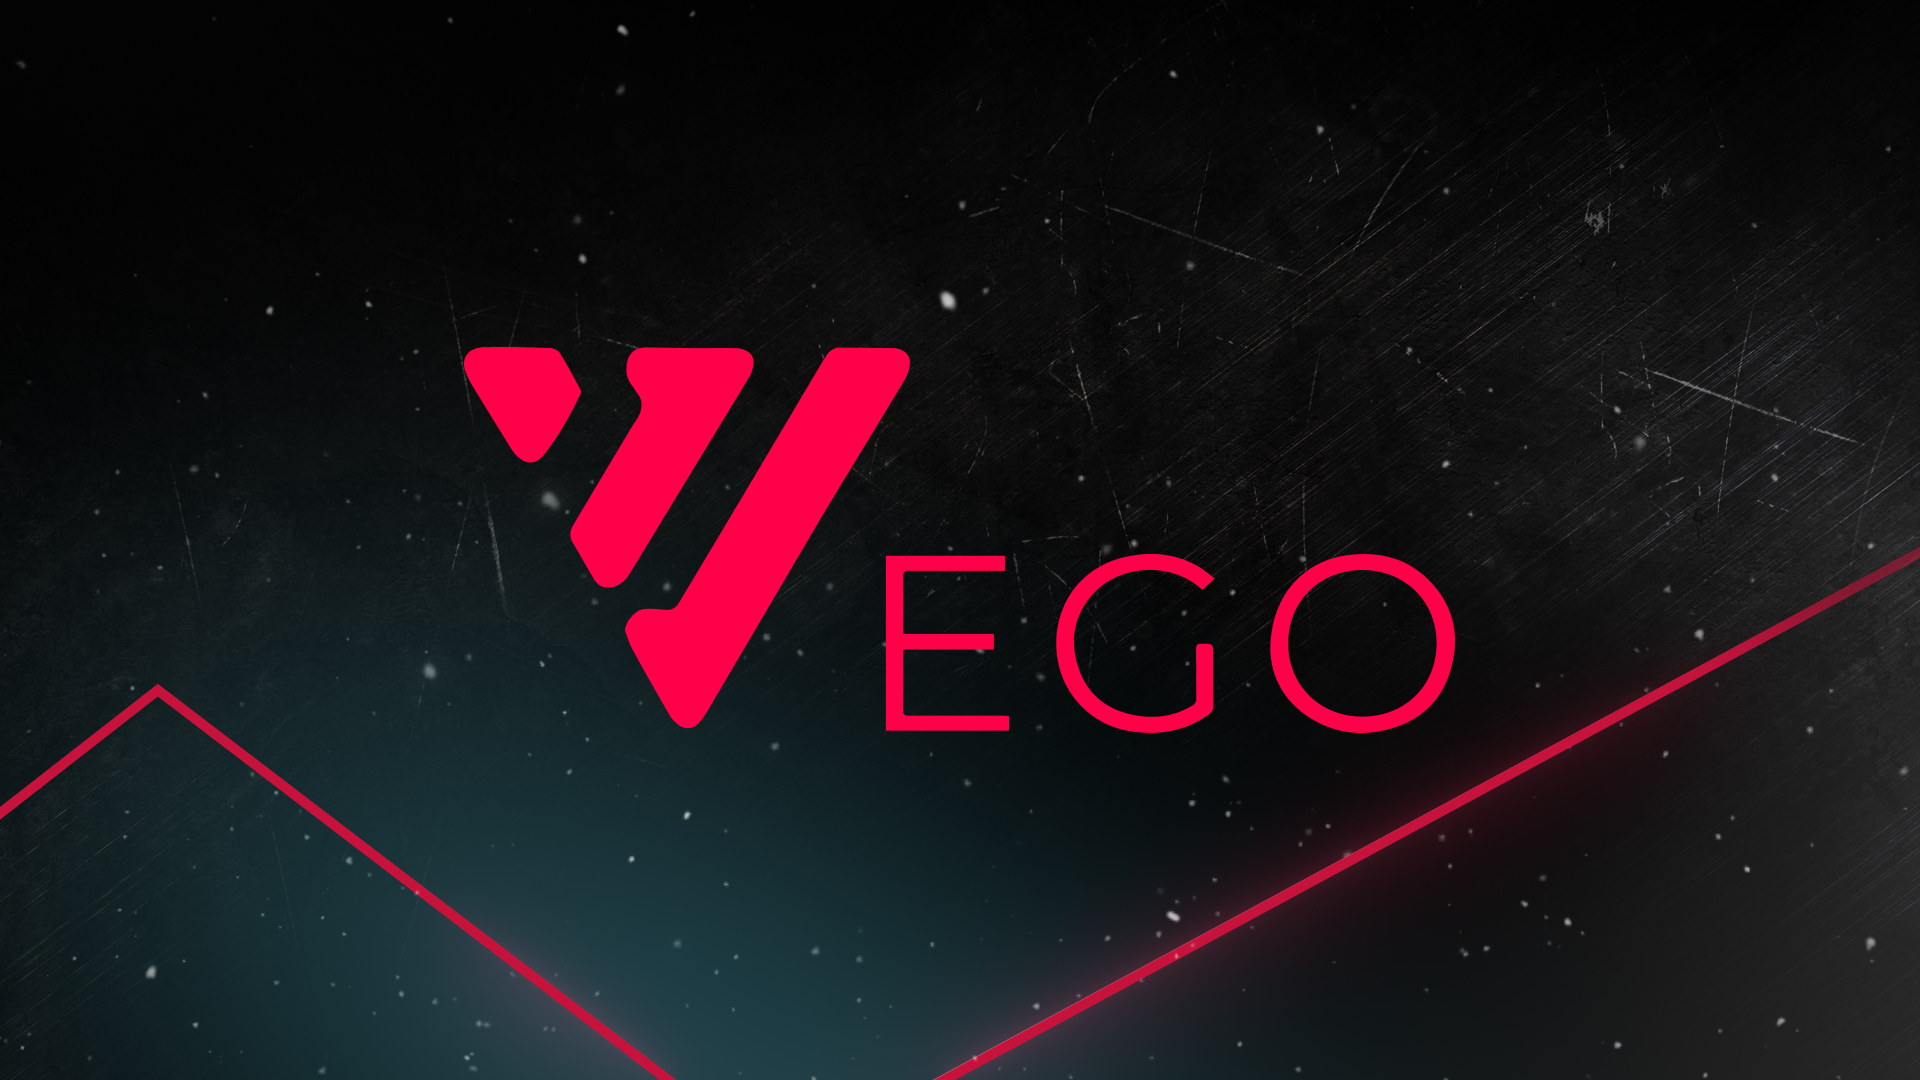 V1 Ego